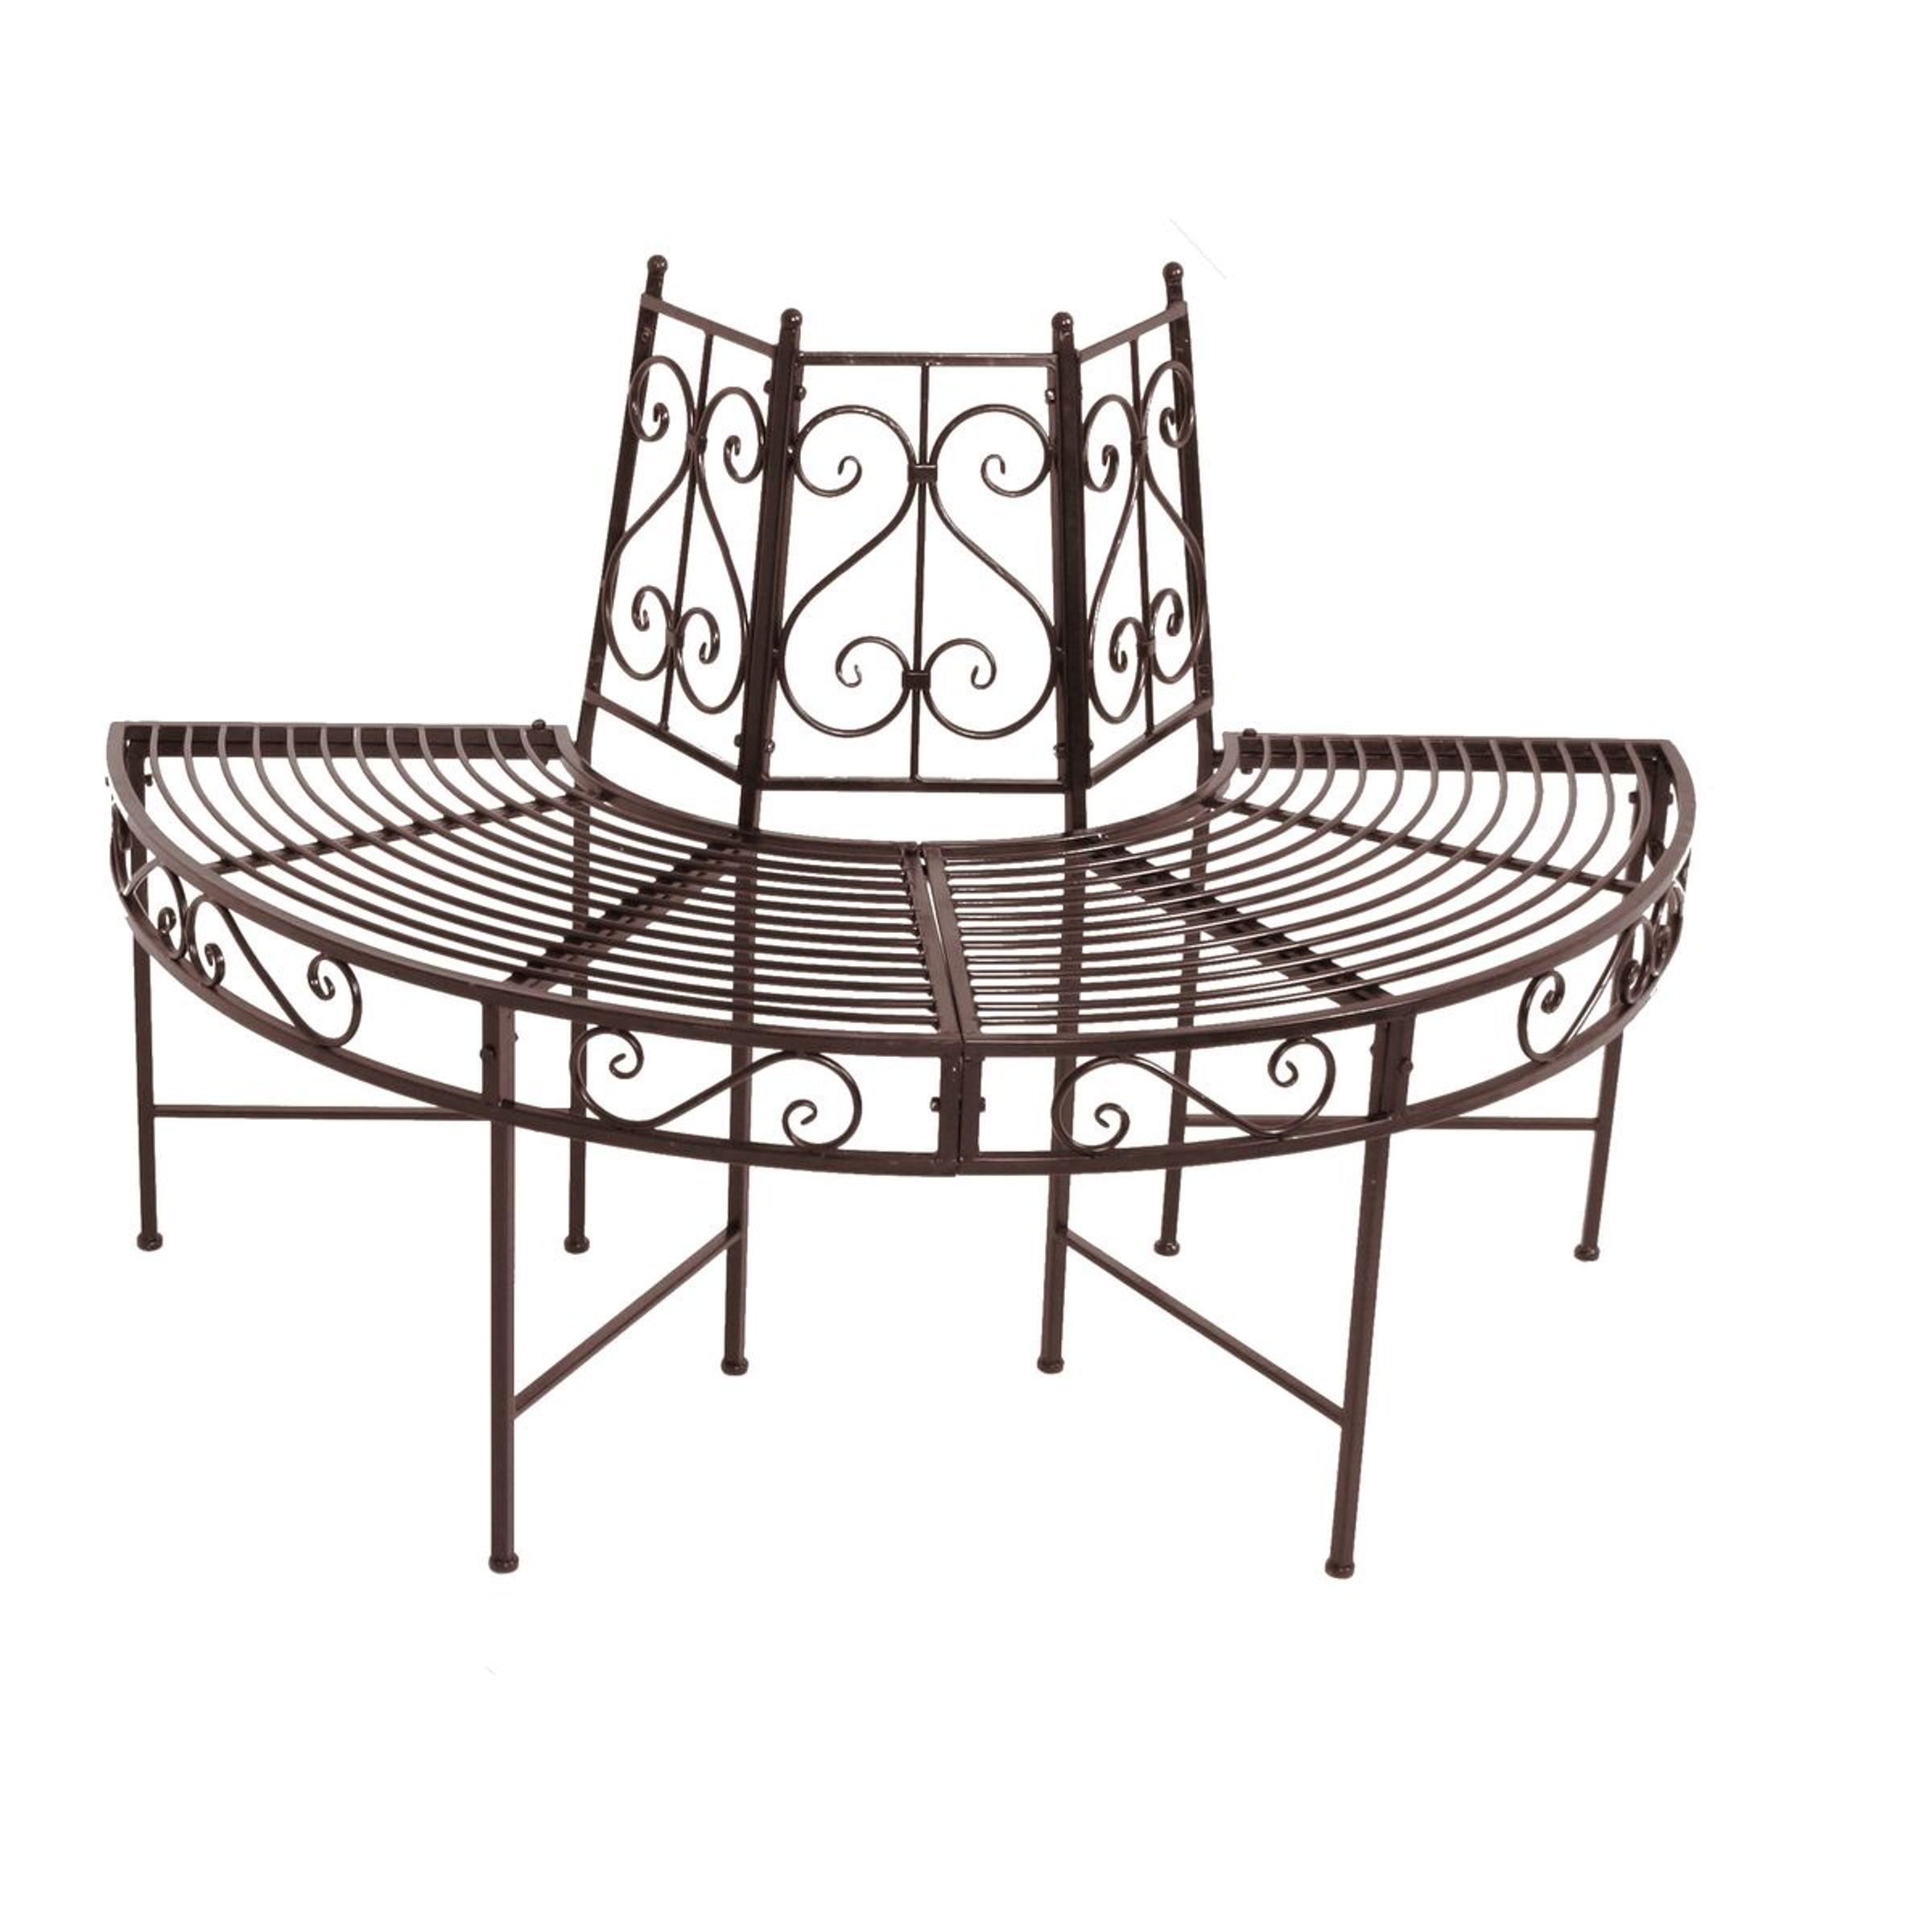 halbkreis baumbank metallbank sitzbank garten park bank metall rost optik ebay. Black Bedroom Furniture Sets. Home Design Ideas